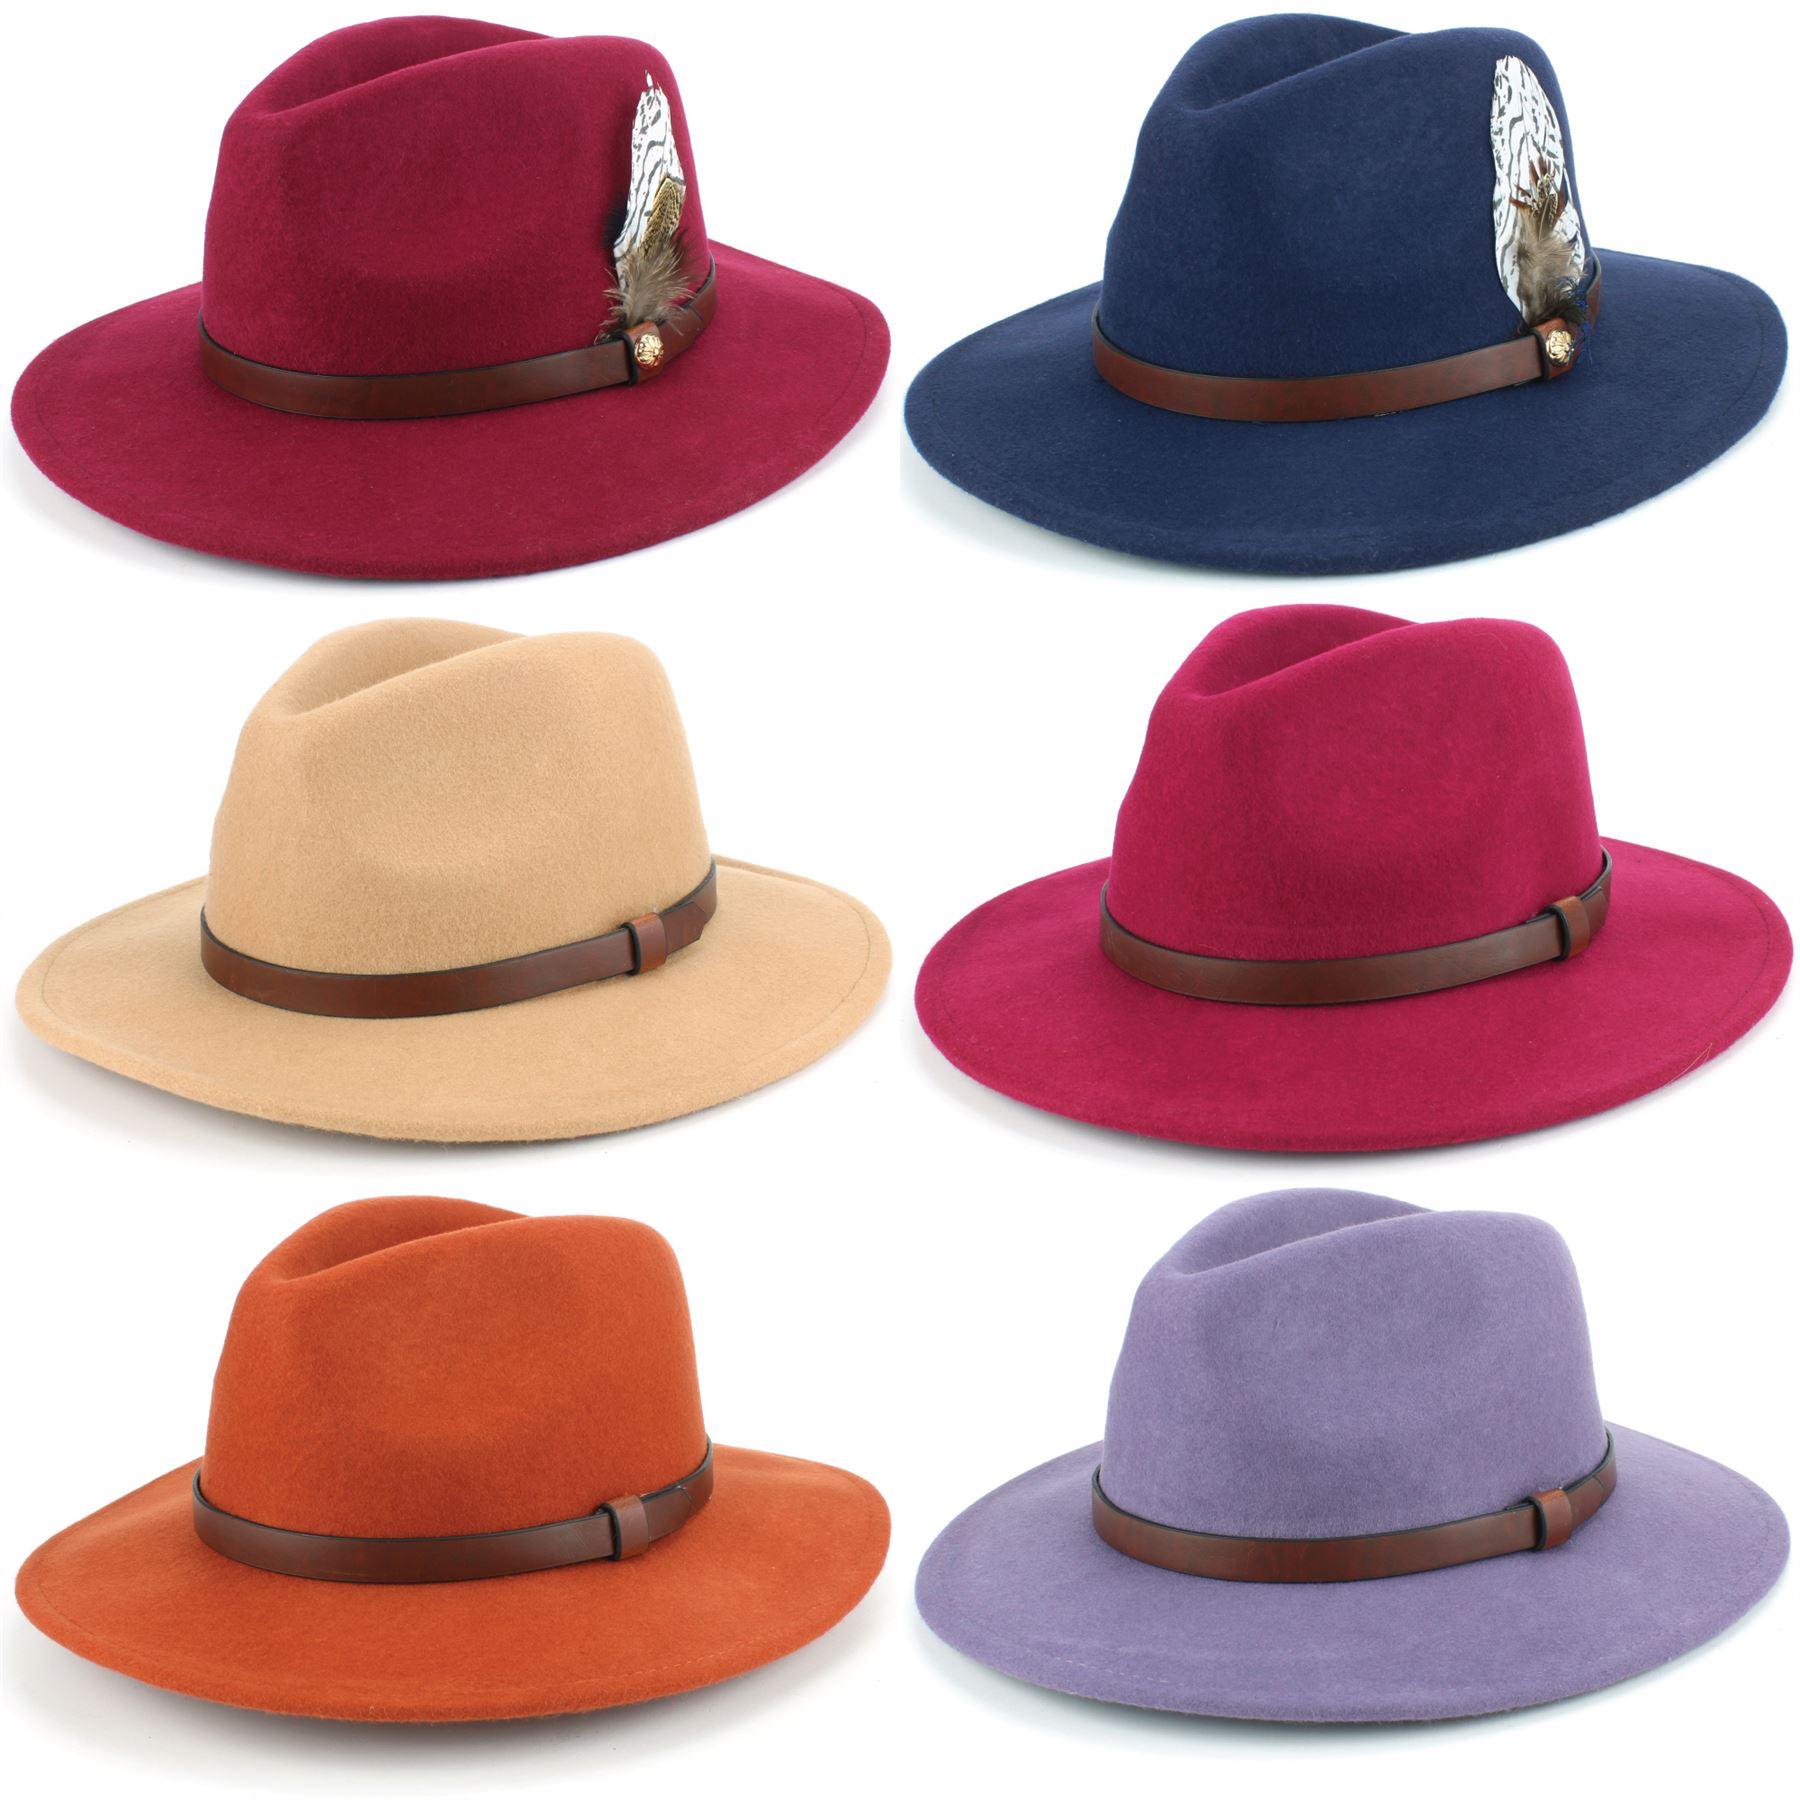 Details about Fedora Hat Wool Felt Hawkins Feather Band Trilby Ladies Men  Travel Brim Travel 61ee3d3feb6